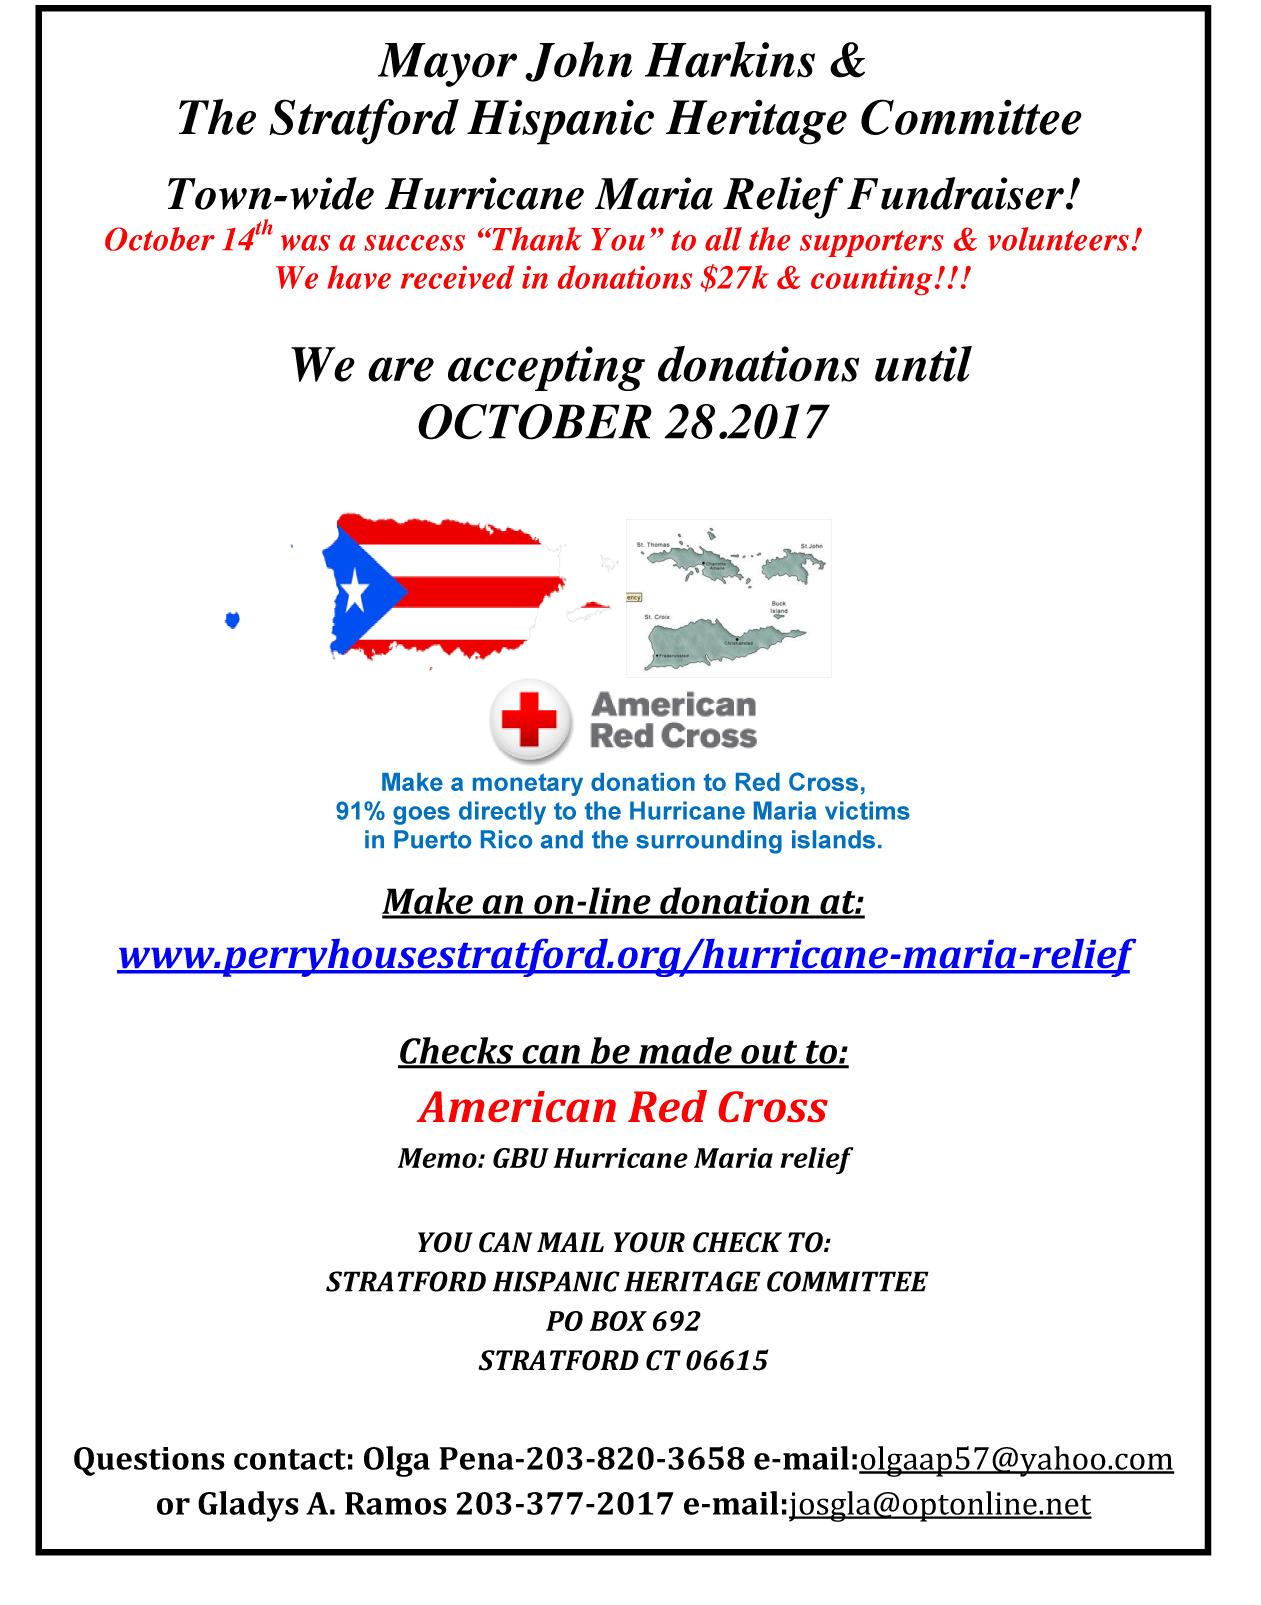 Stratford townwide Hurricane Maria fundraiser.jpg